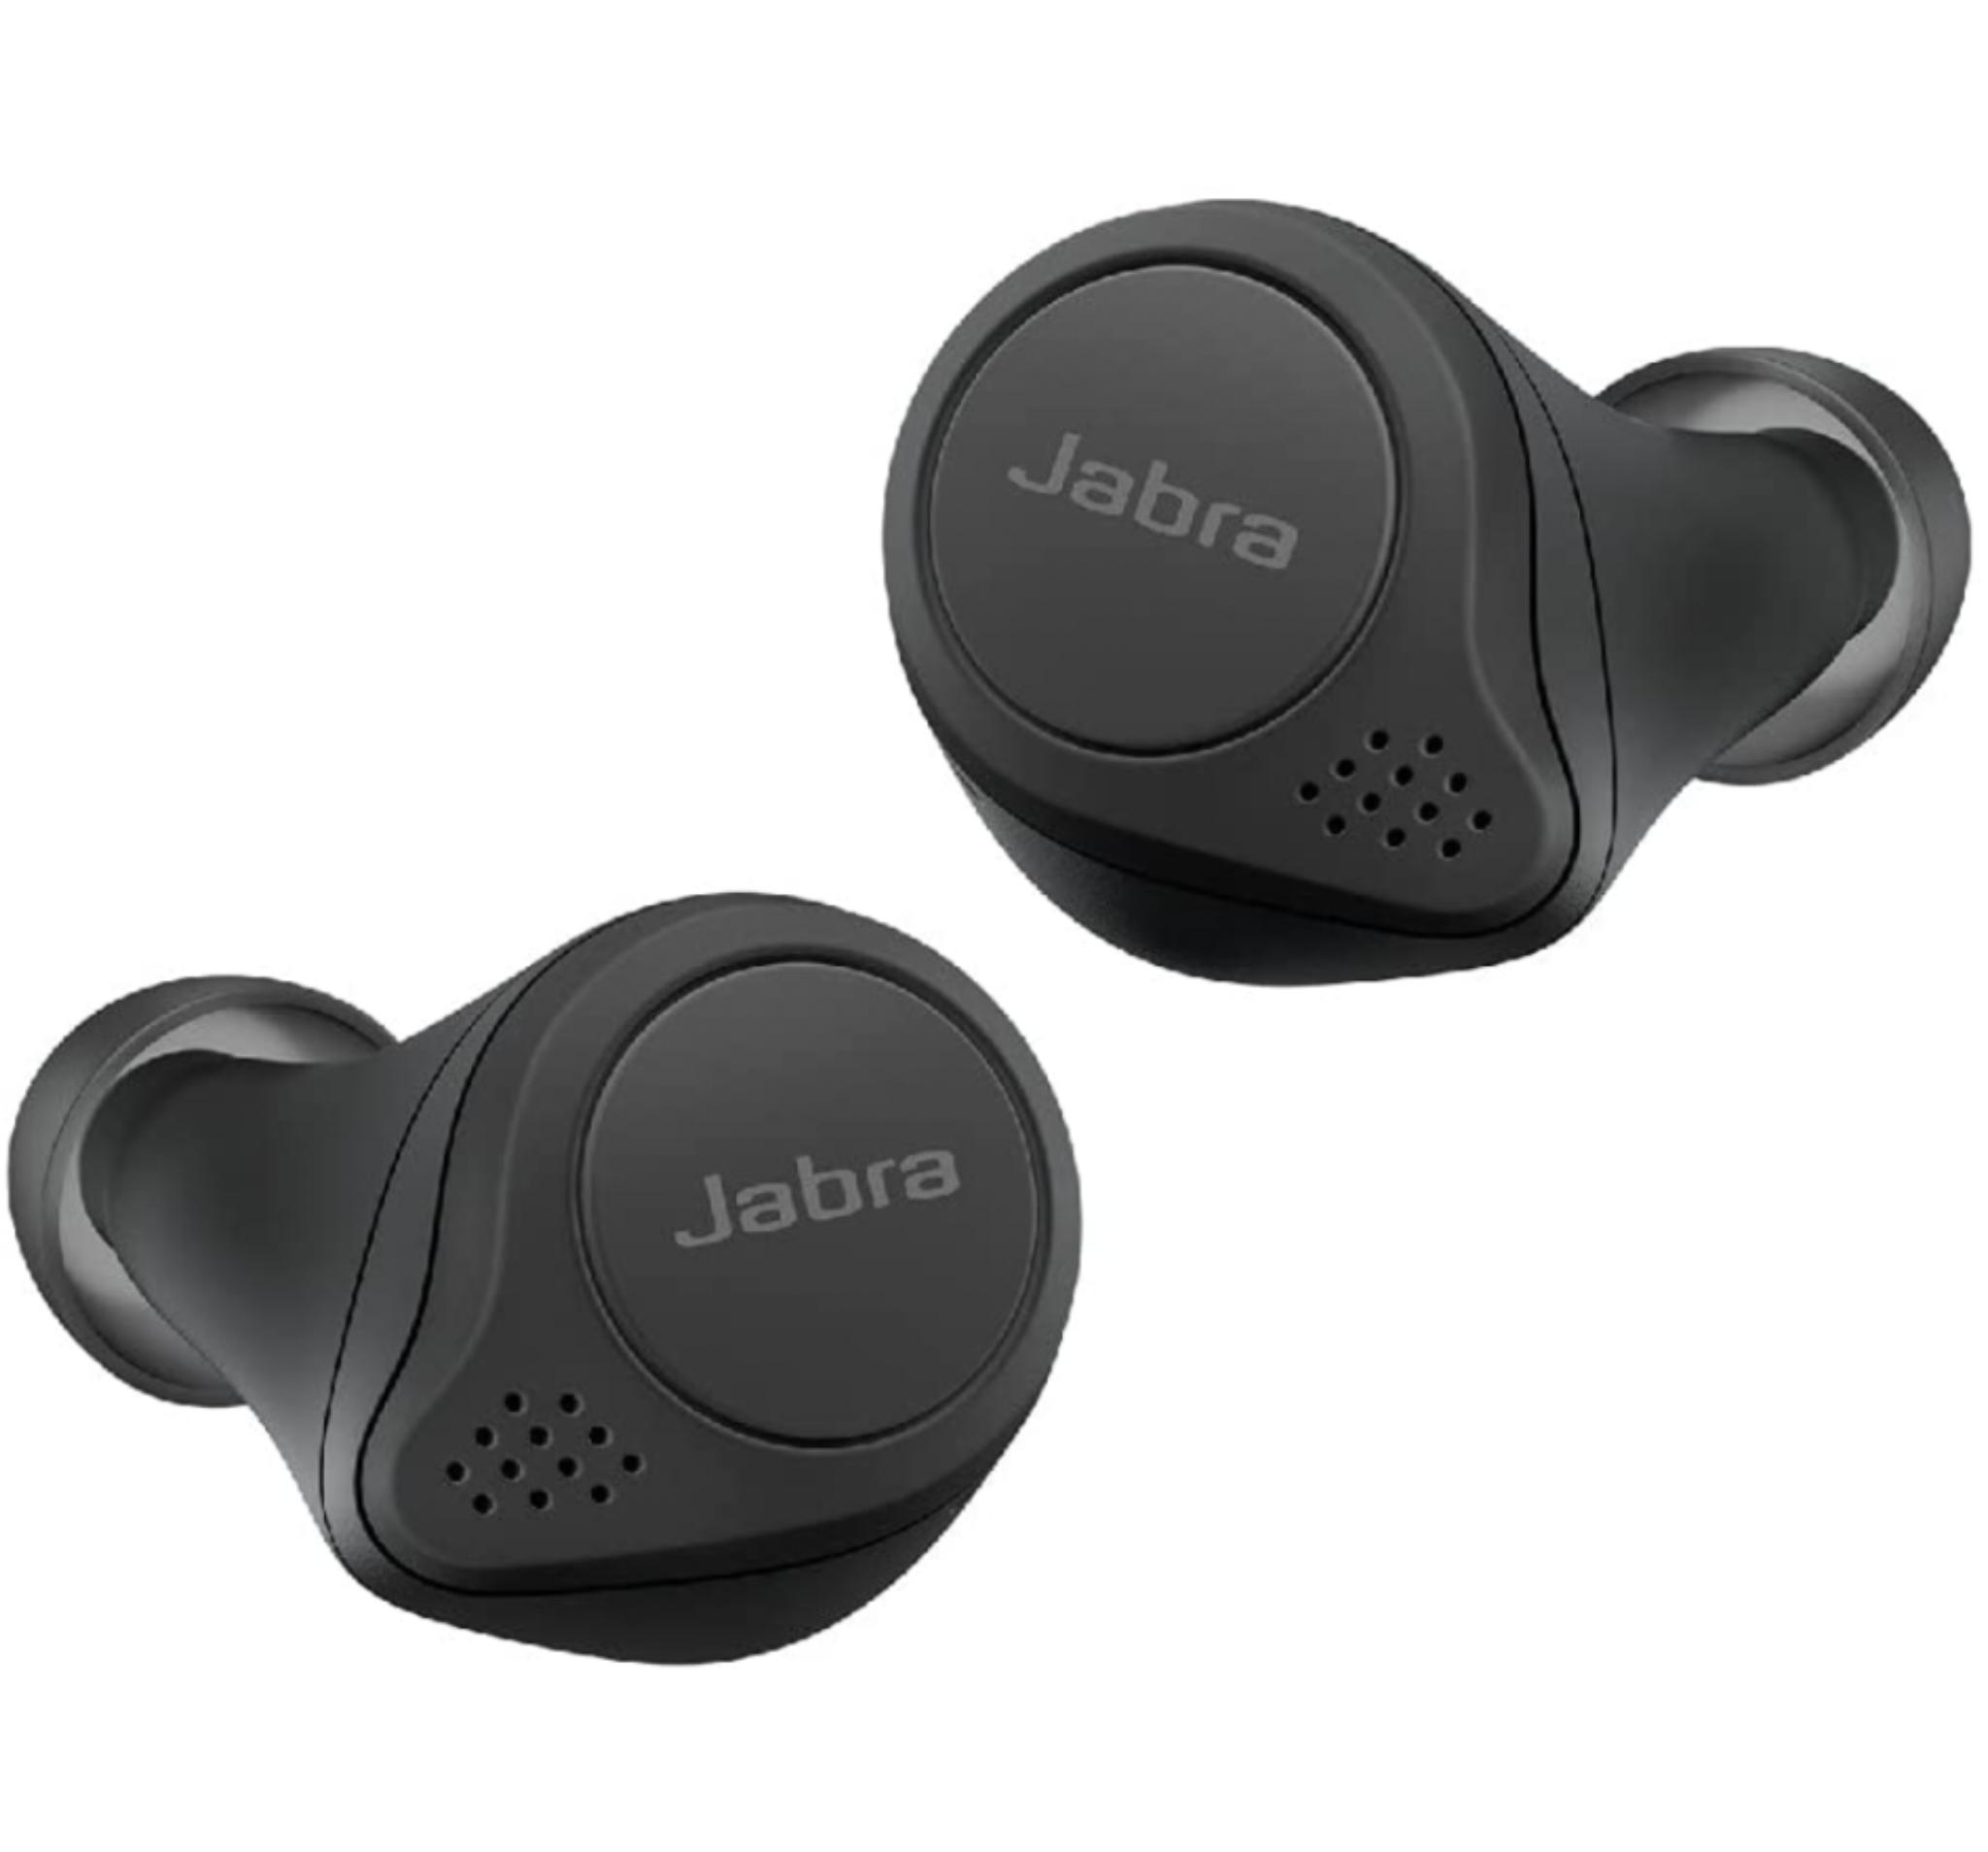 Jabra Elite 75t Earbuds - Classic (All colours) - £99 Amazon Prime Exclusive